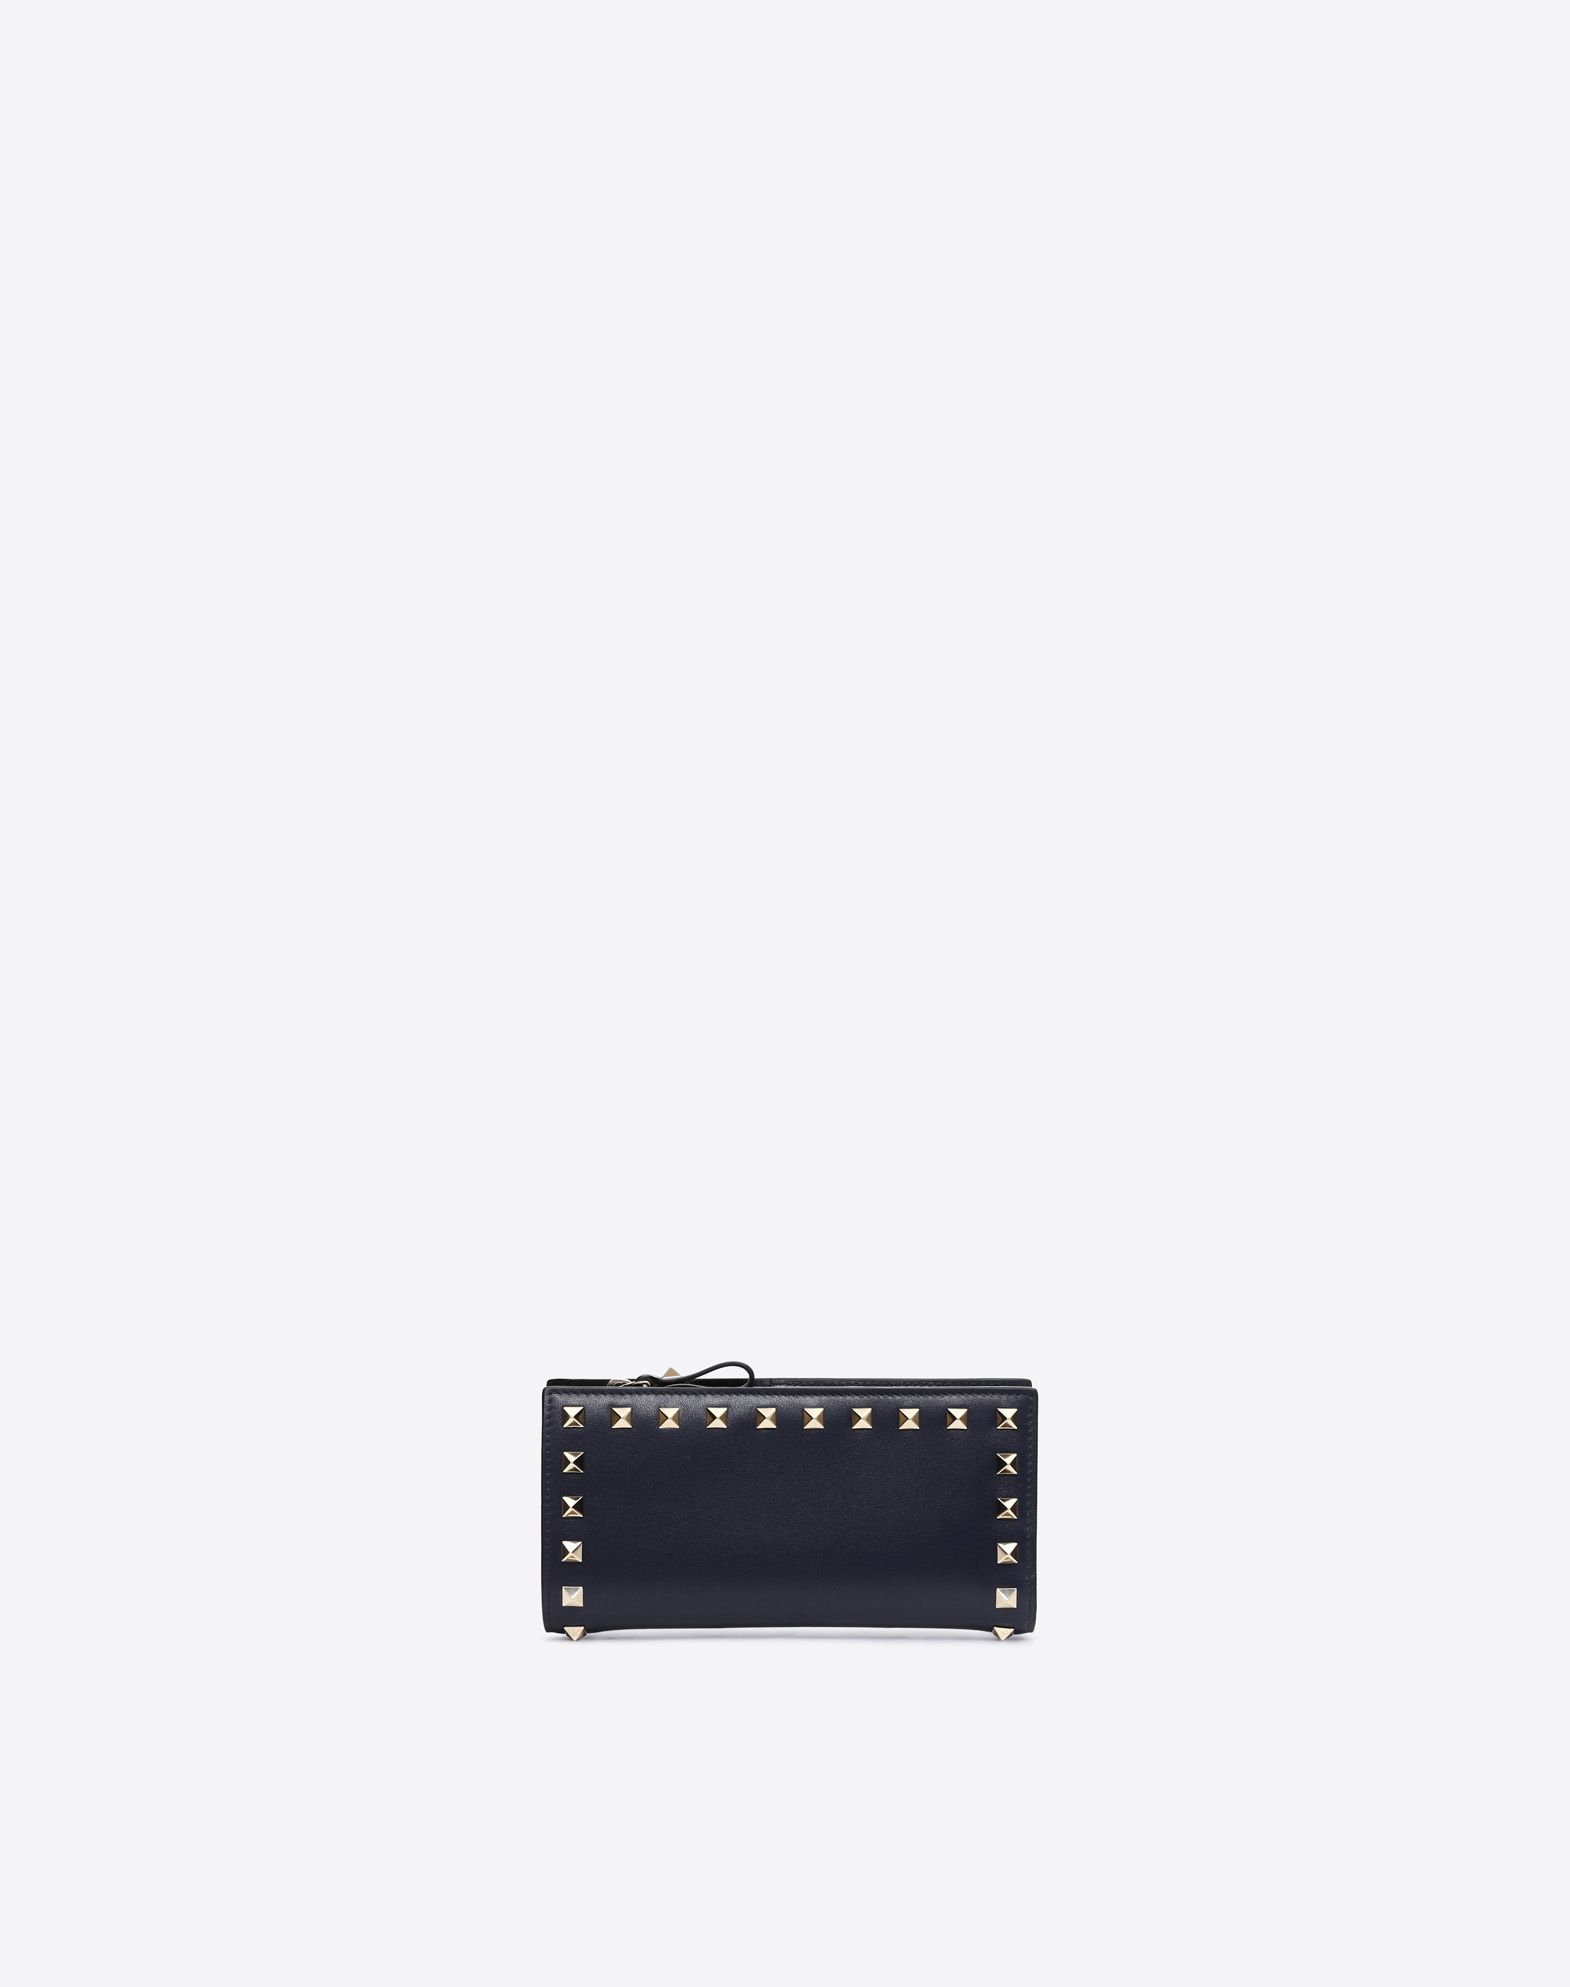 VALENTINO GARAVANI Rockstud Wallet FLAP WALLETS D f